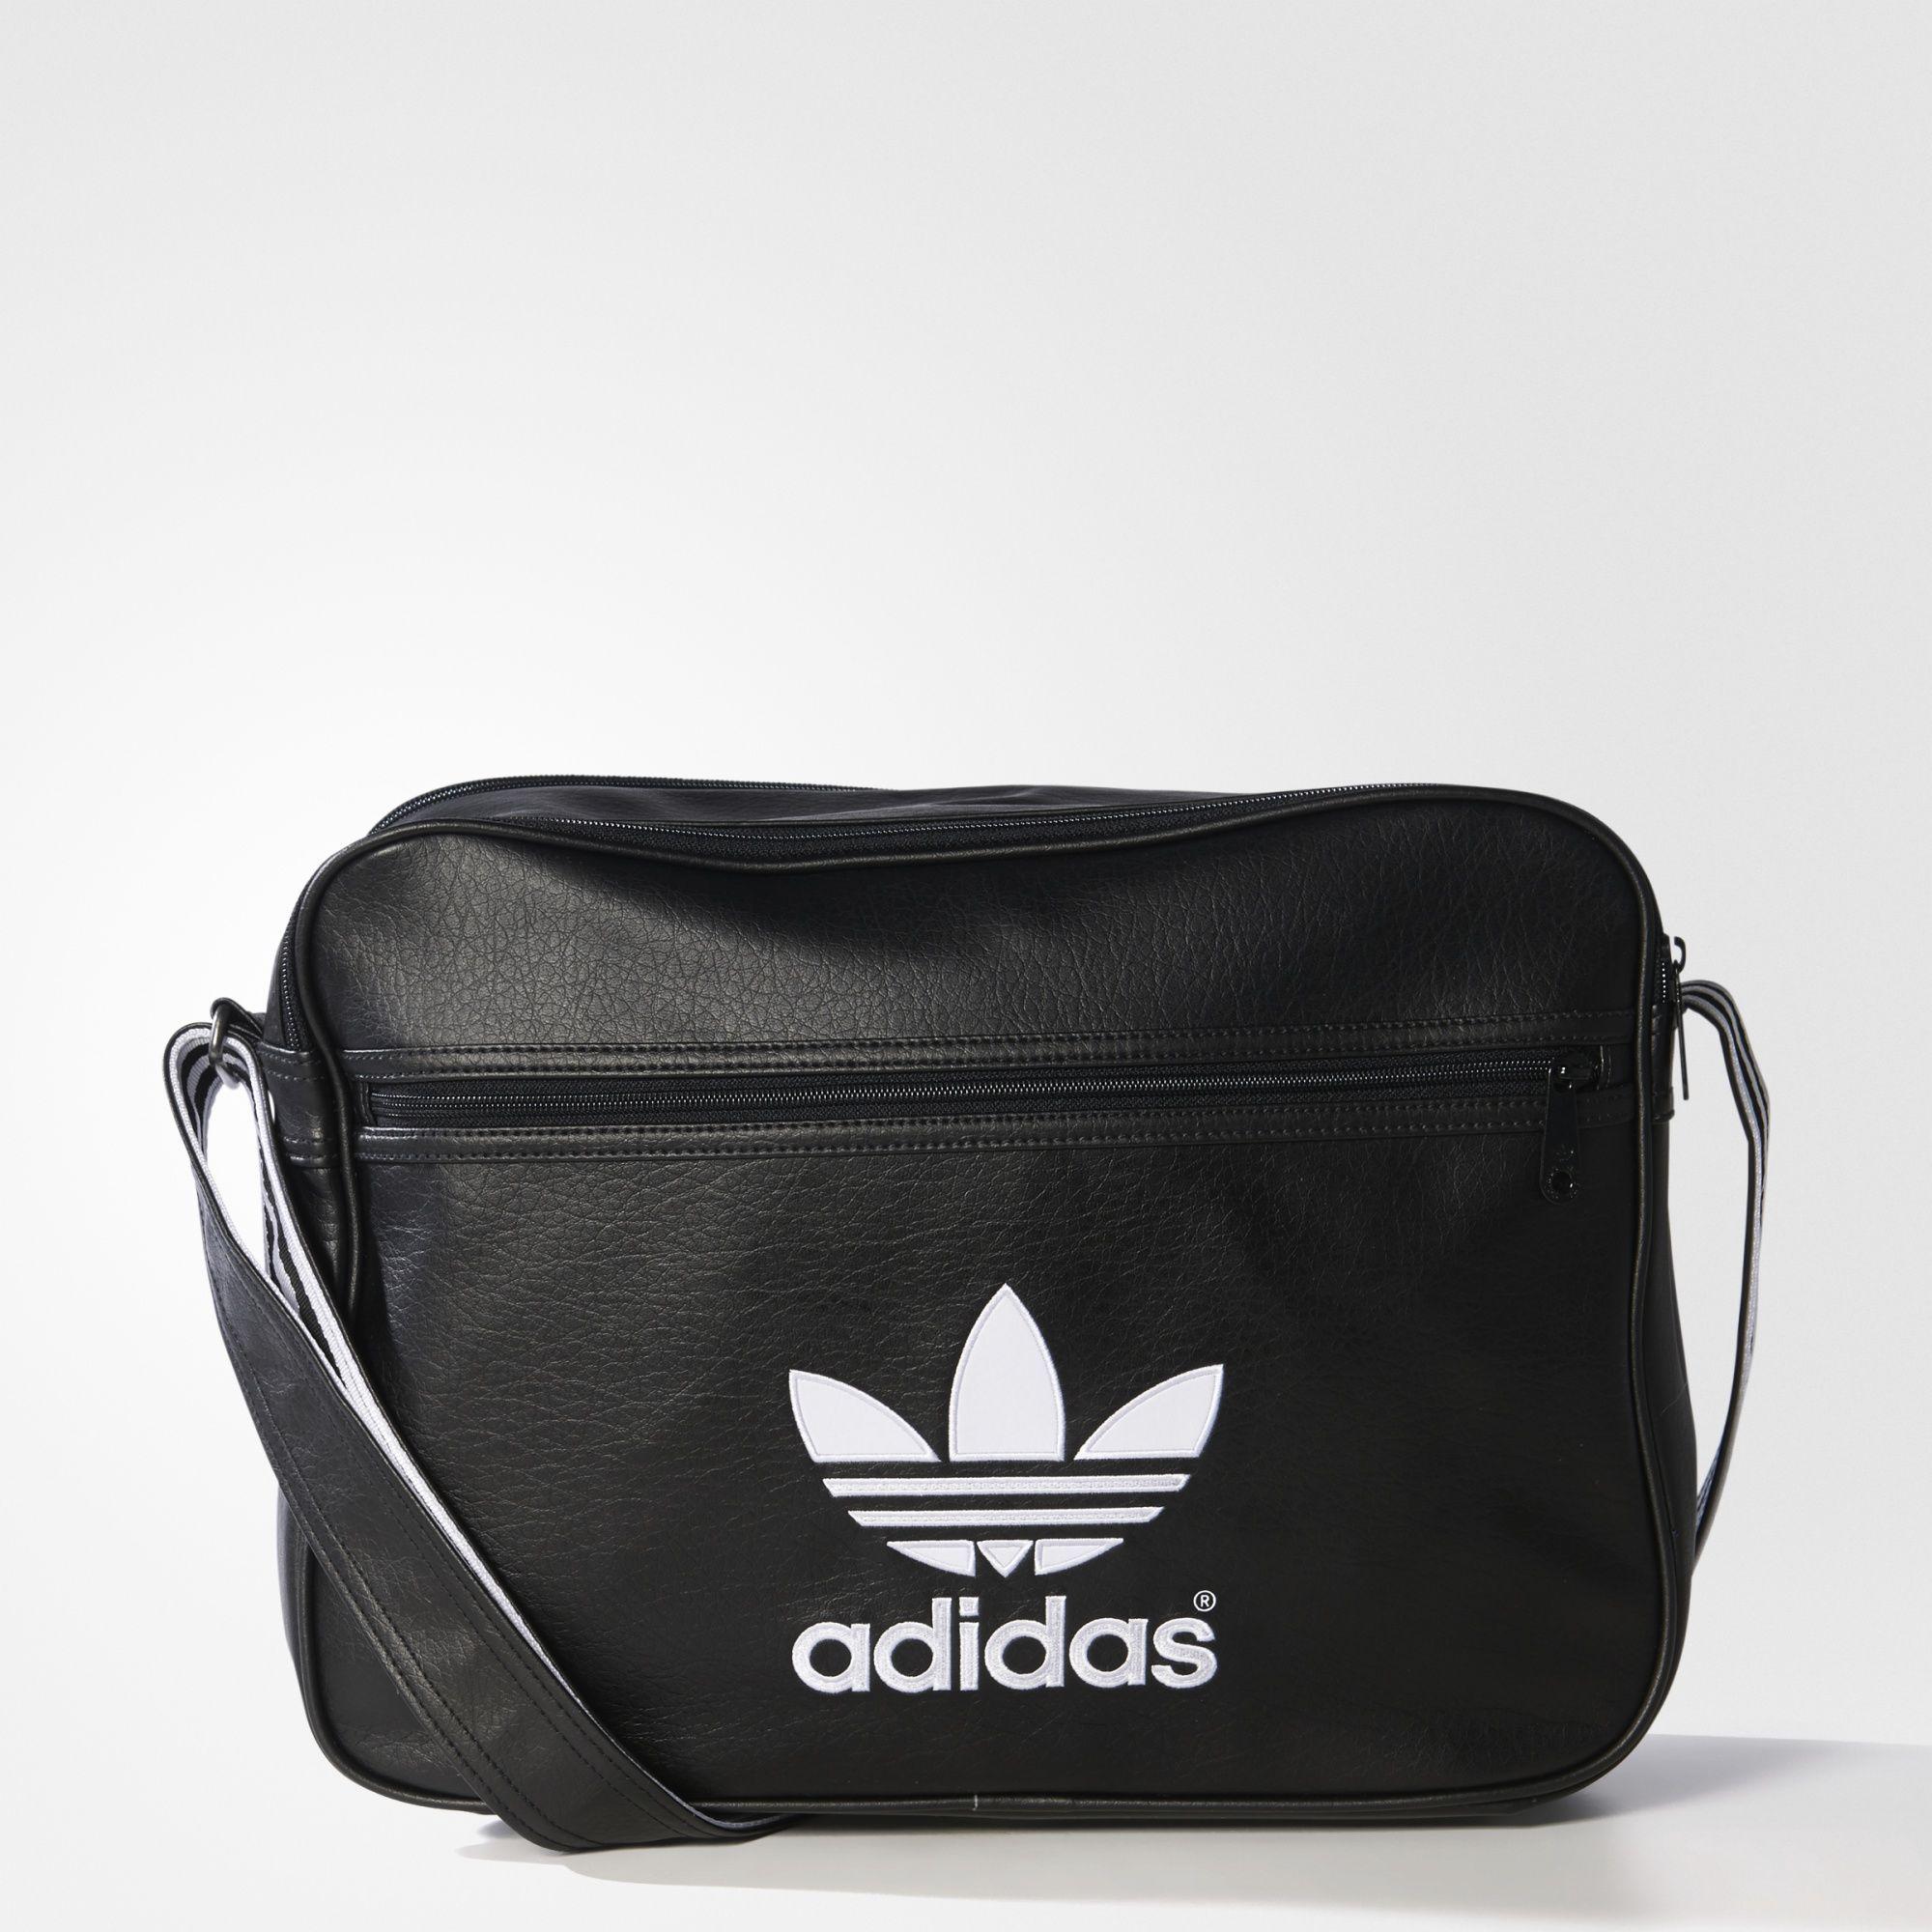 316a37ba7 Bolsa Airliner Adicolor | Lista de desejos <3 | Bolsa adidas, Adidas ...